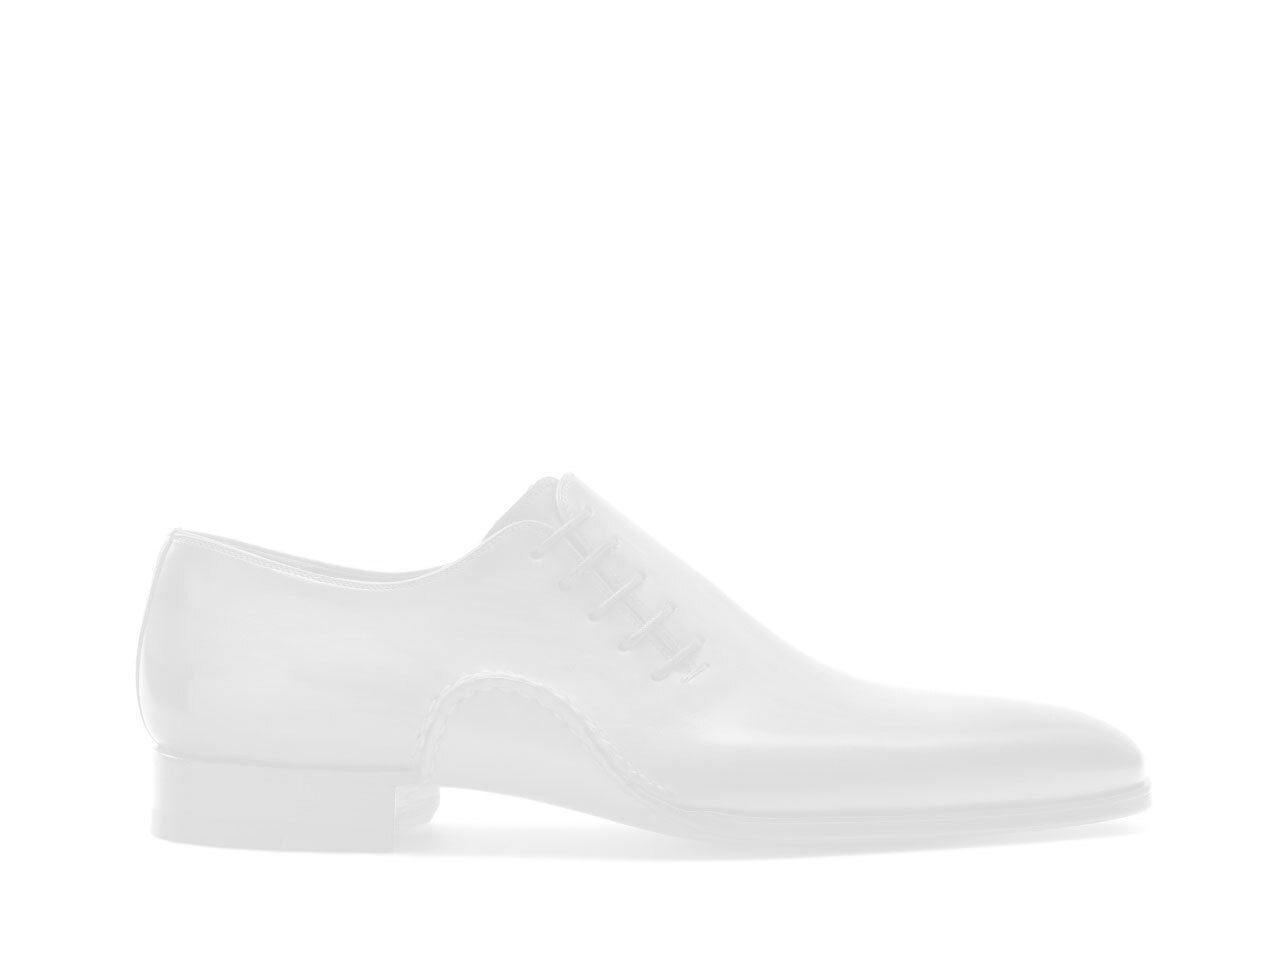 Sole of the Magnanni Ecija Black Men's Sneakers